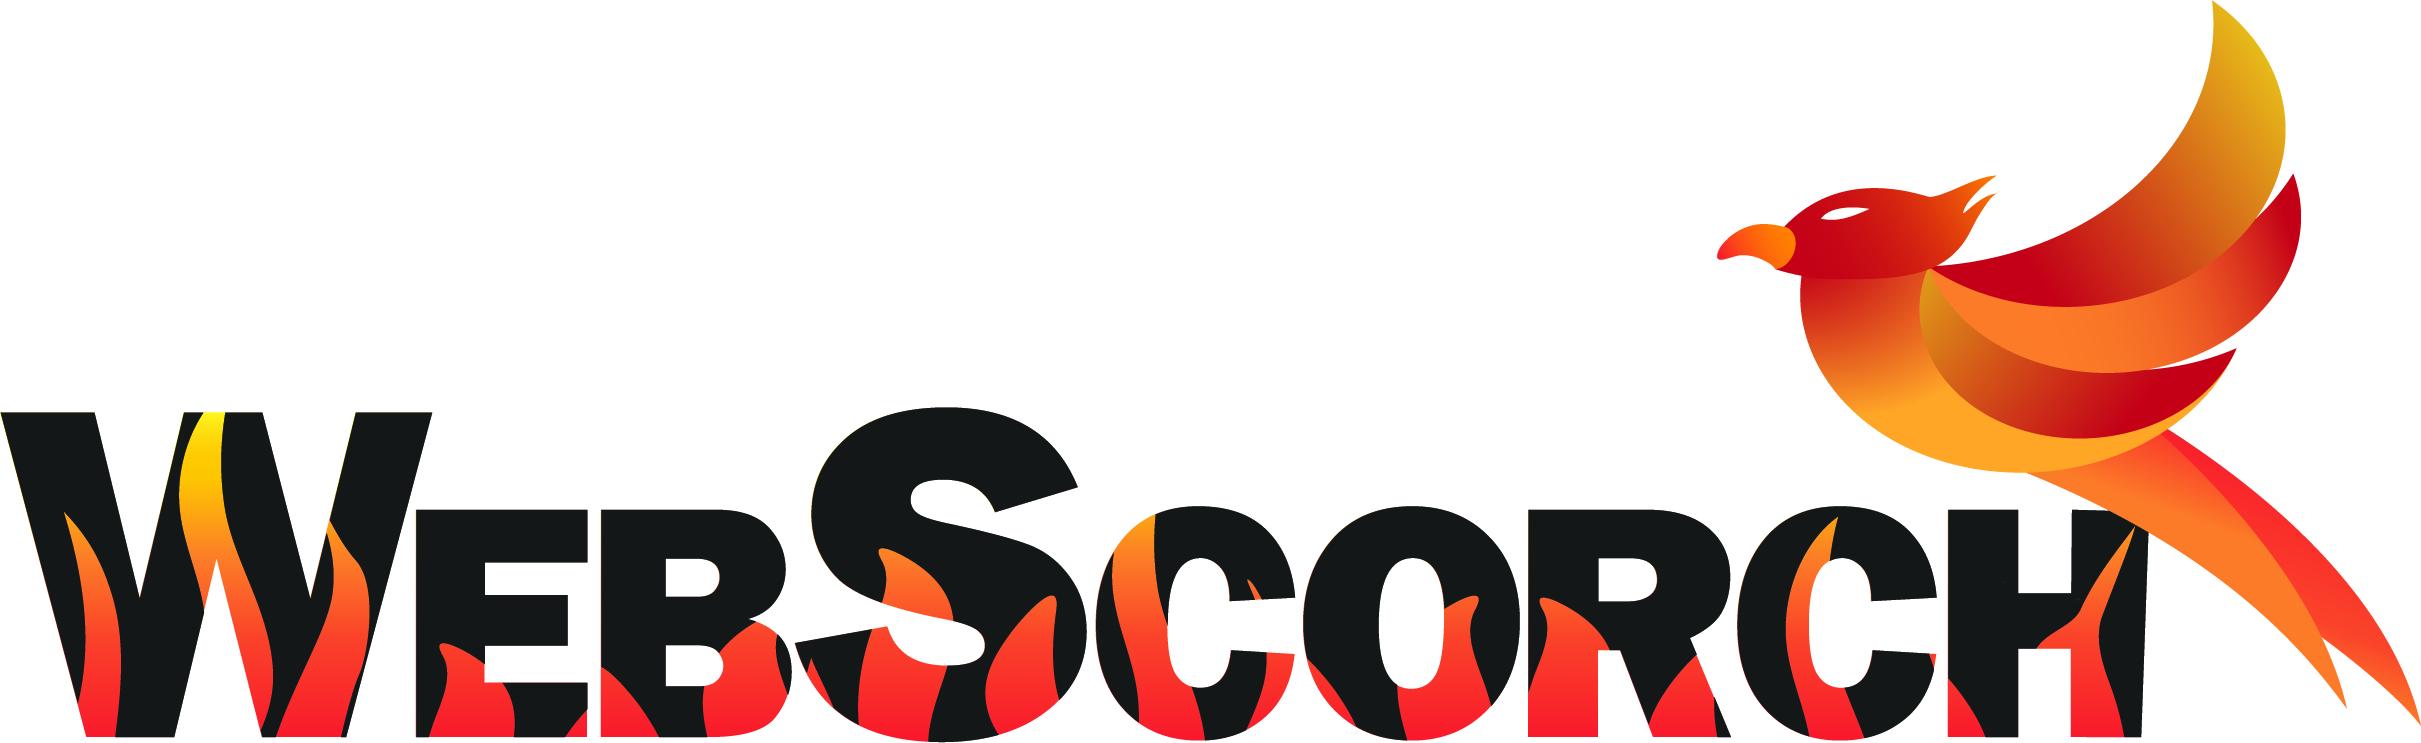 WebScorch web hosting and website management